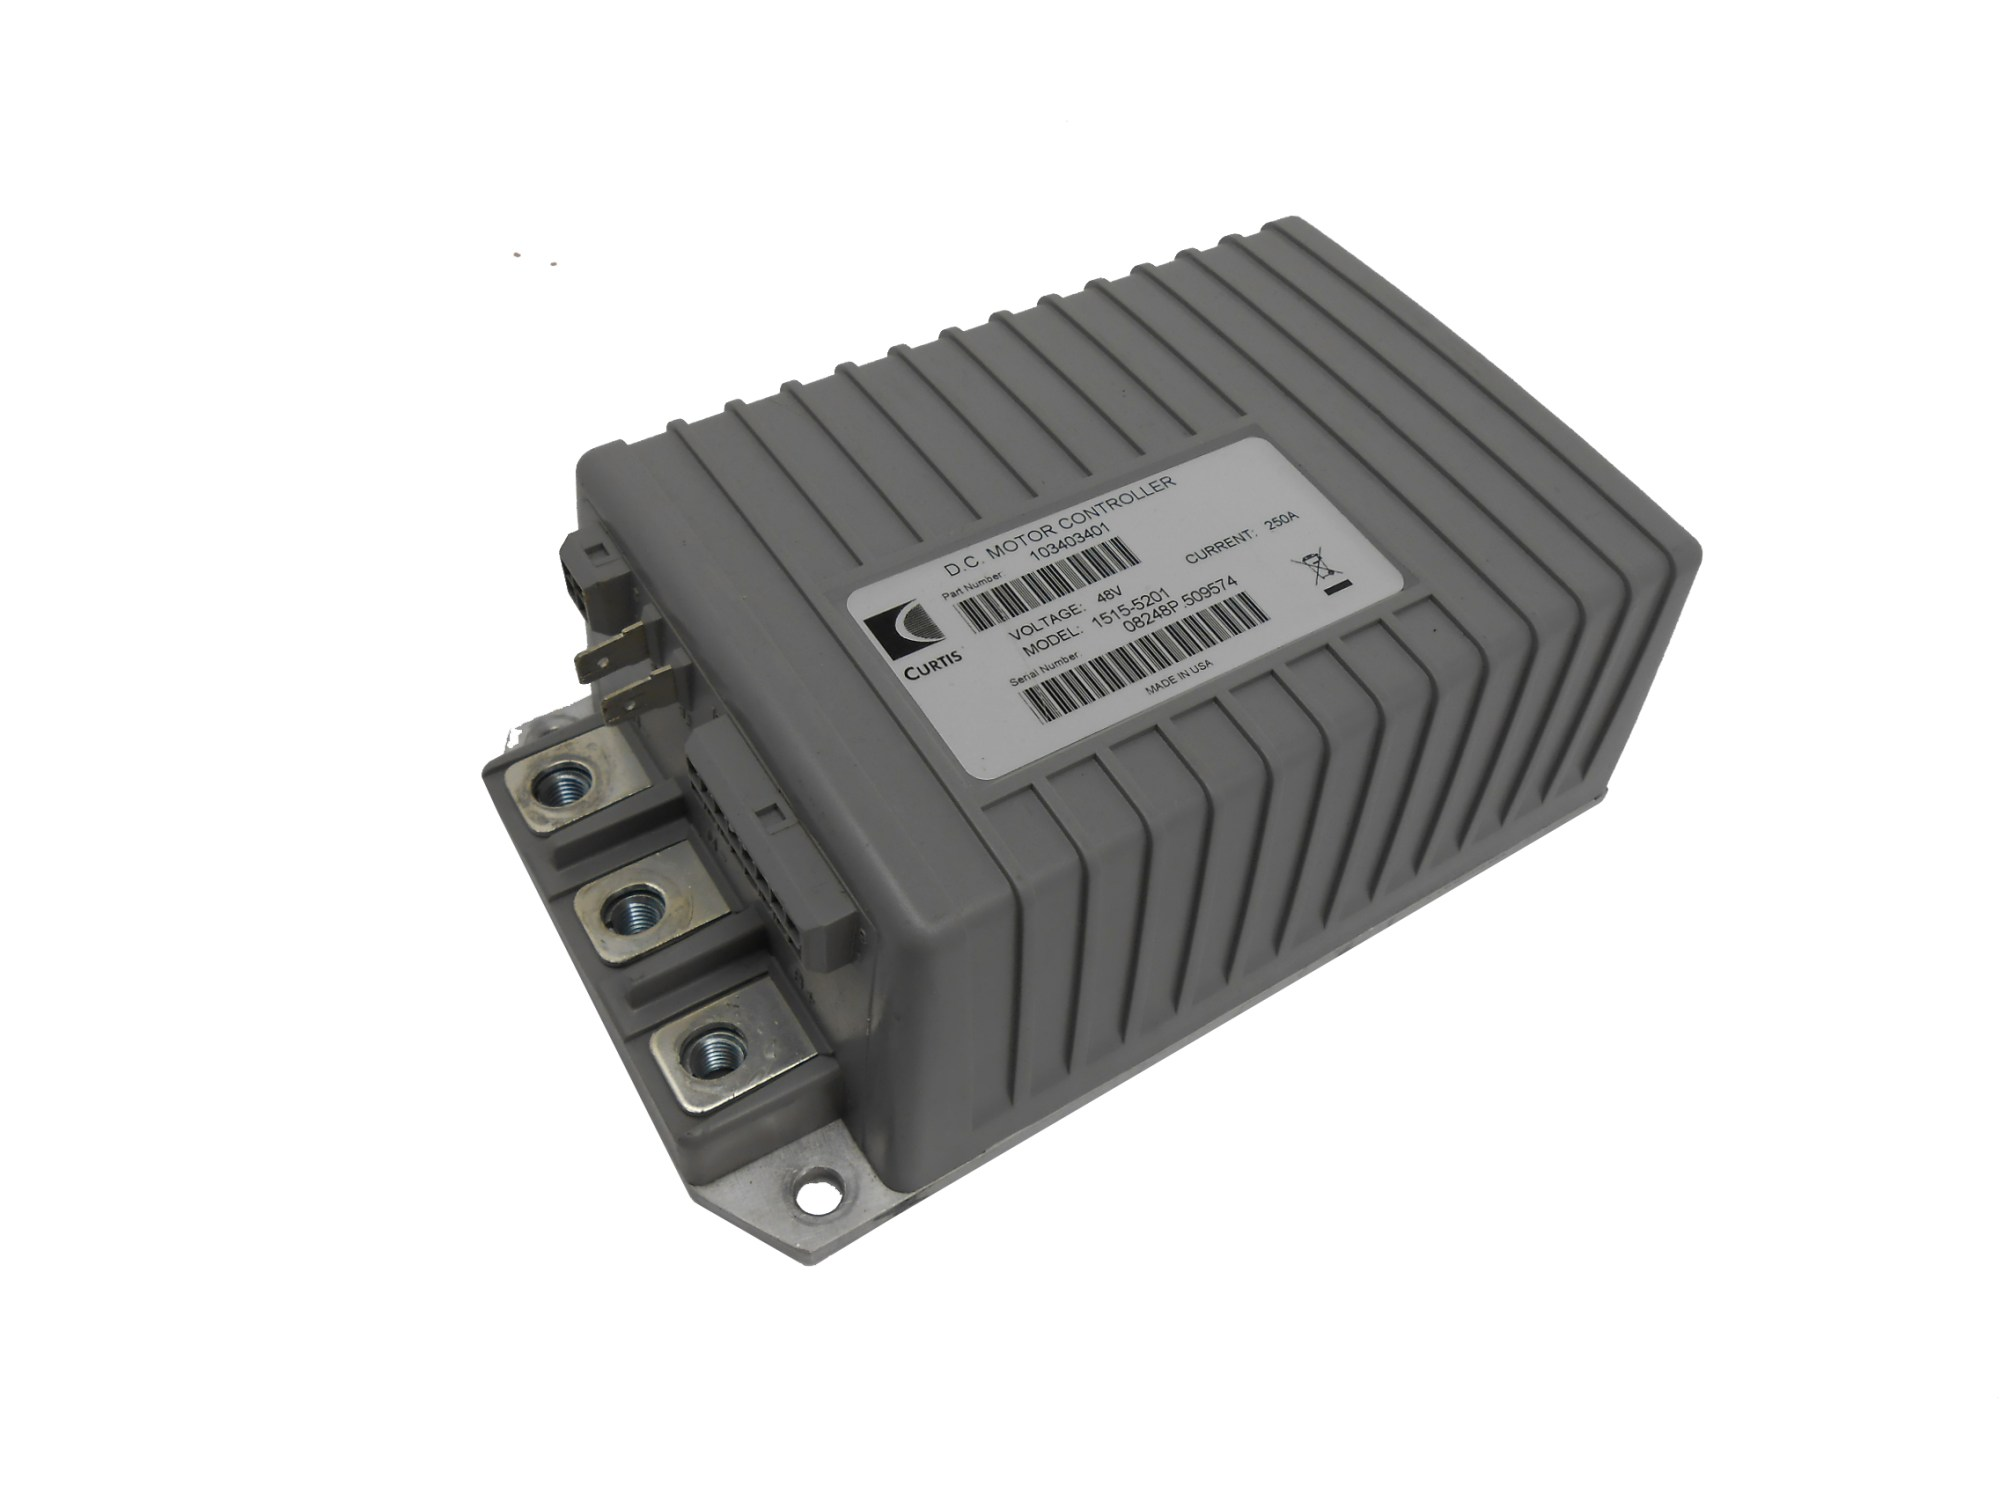 hight resolution of club carcurtis controller wiring diagram 48 volt golf cart 16